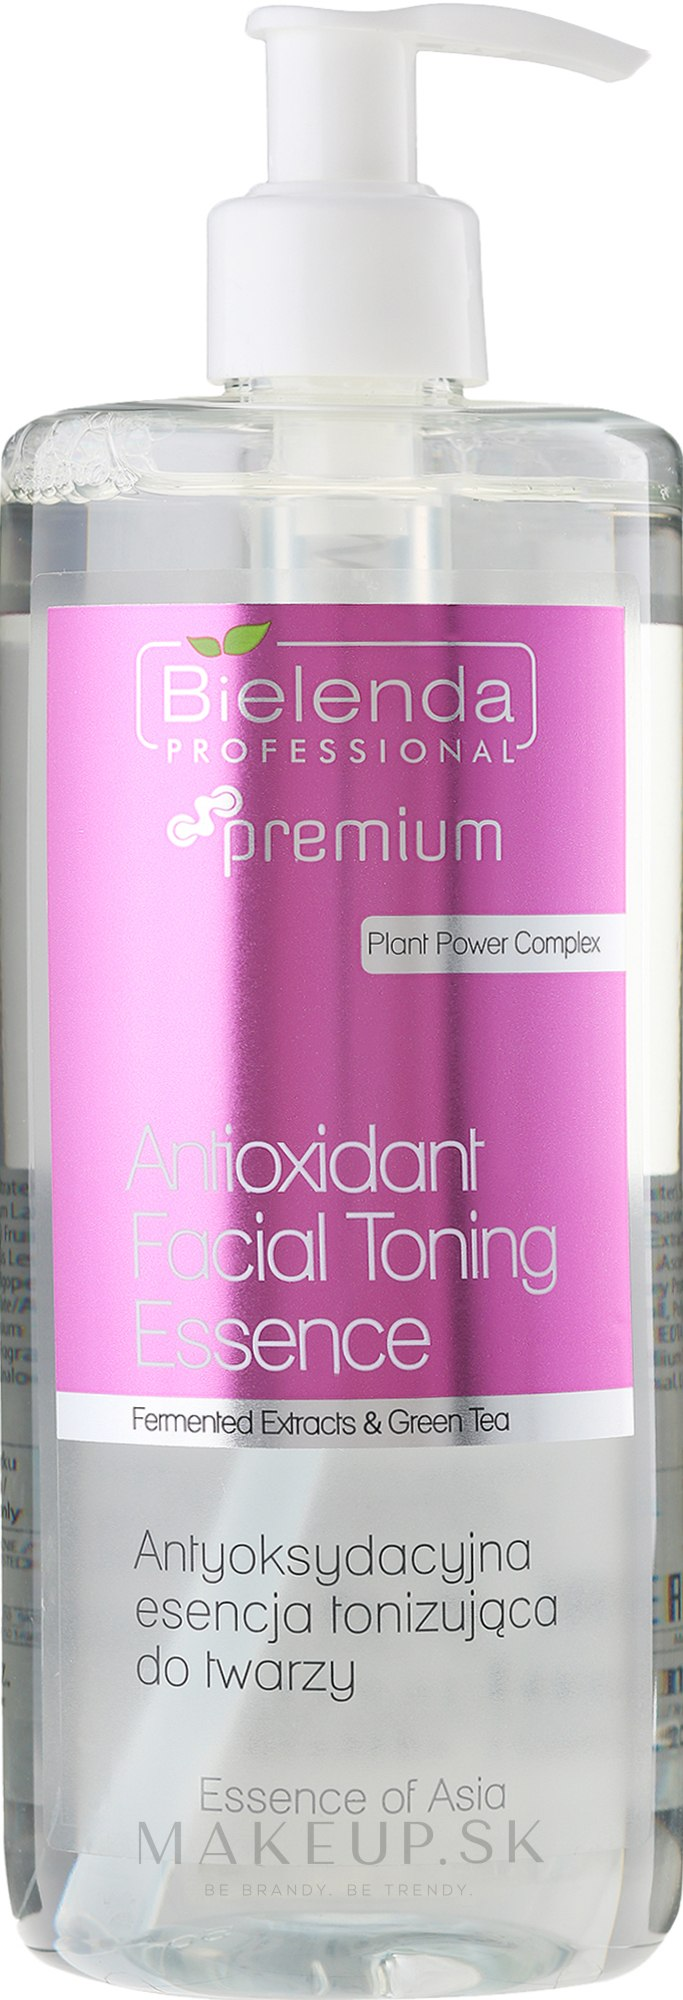 Pleťové tonikum - Bielenda Professional Essence of Asia Tonic — Obrázky 500 ml